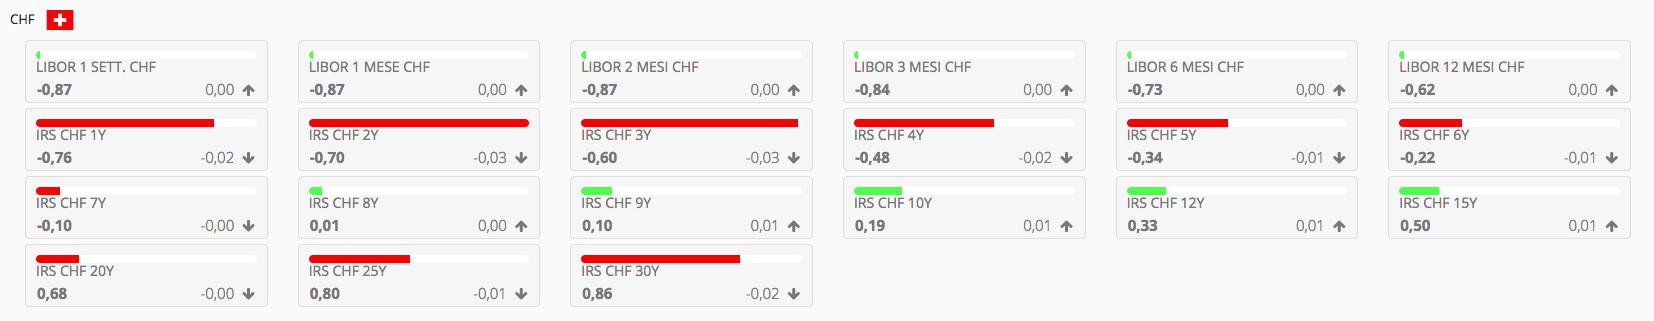 CHF interest rates